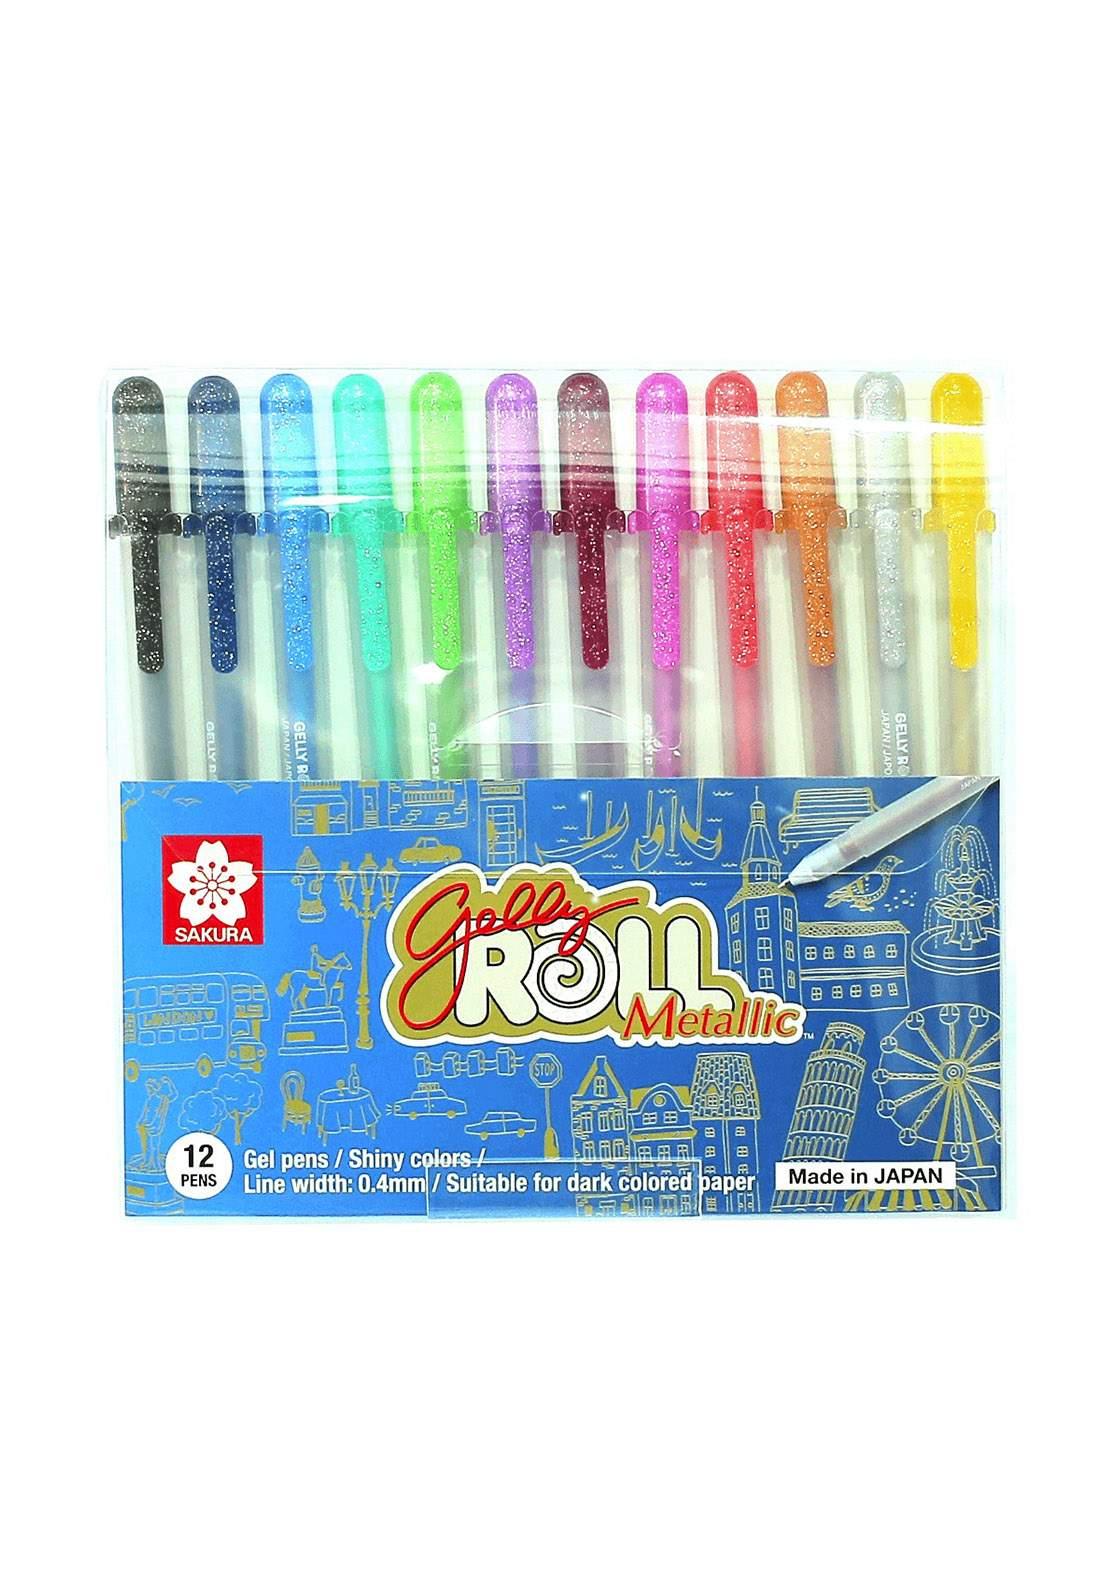 Sakura Gell Roll Metallic 12 colors أقلام تلوين معدنية لماعة 12 لون